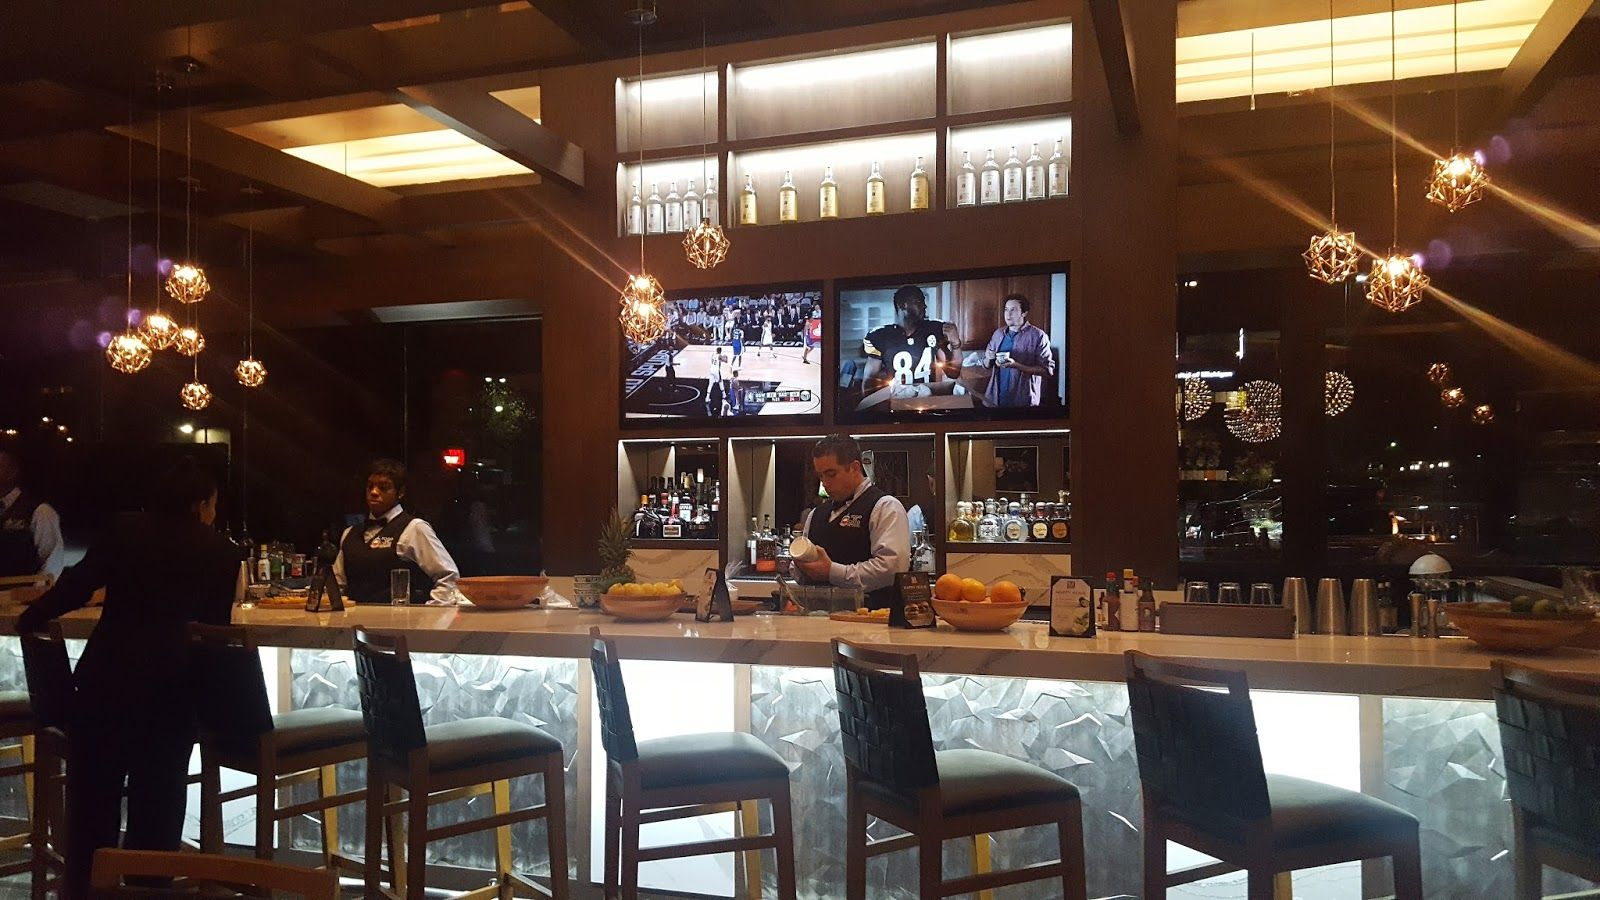 Plush Troy Mi Restaurants Near Me Clawson Steak House Banquet Menu